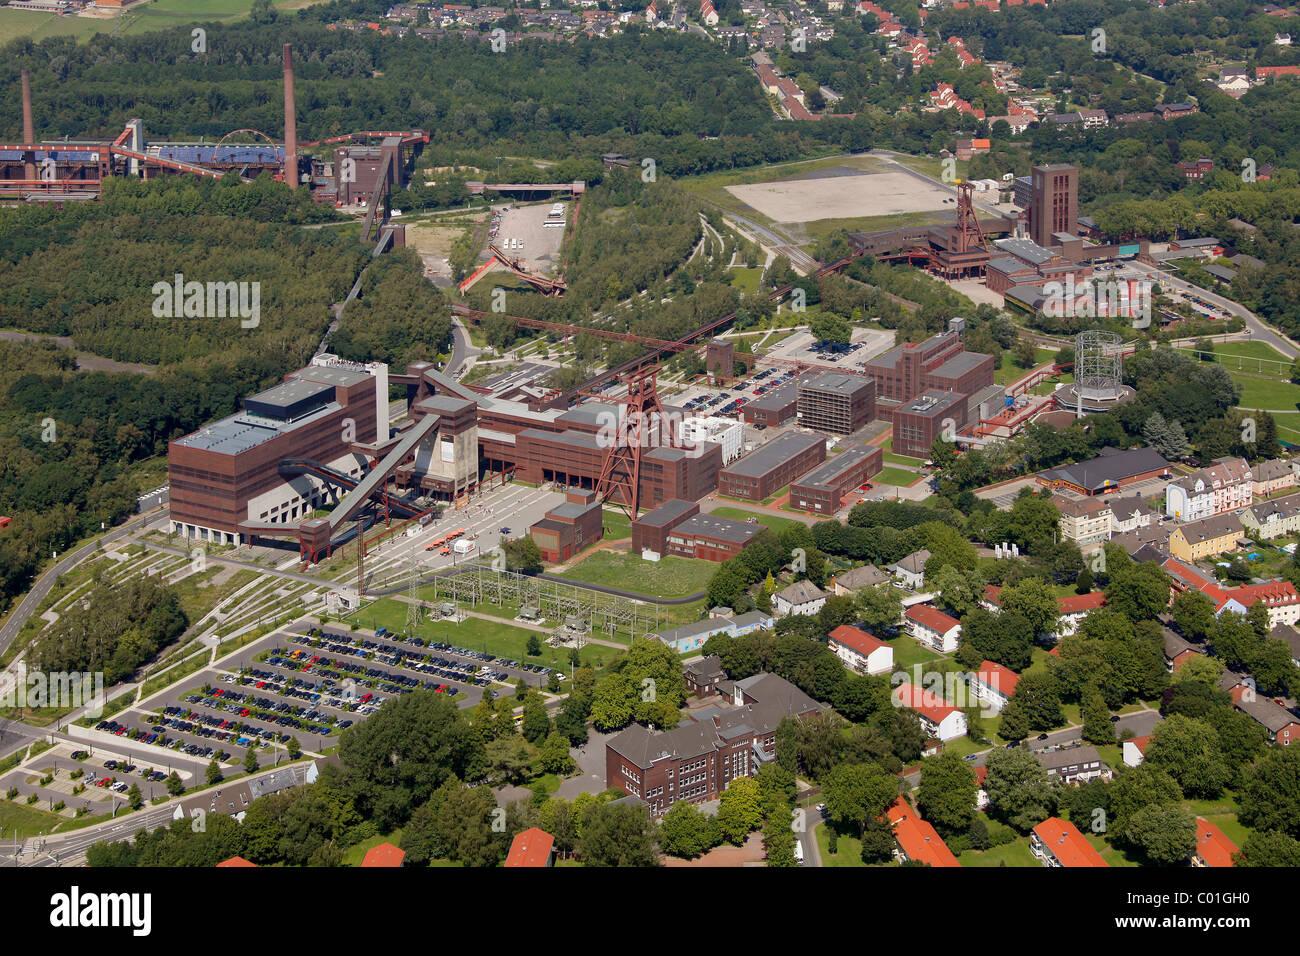 Aerial view, Zollverein Coal Mine Industrial Complex, design school, Saana building, World Cultural Heritage site, - Stock Image